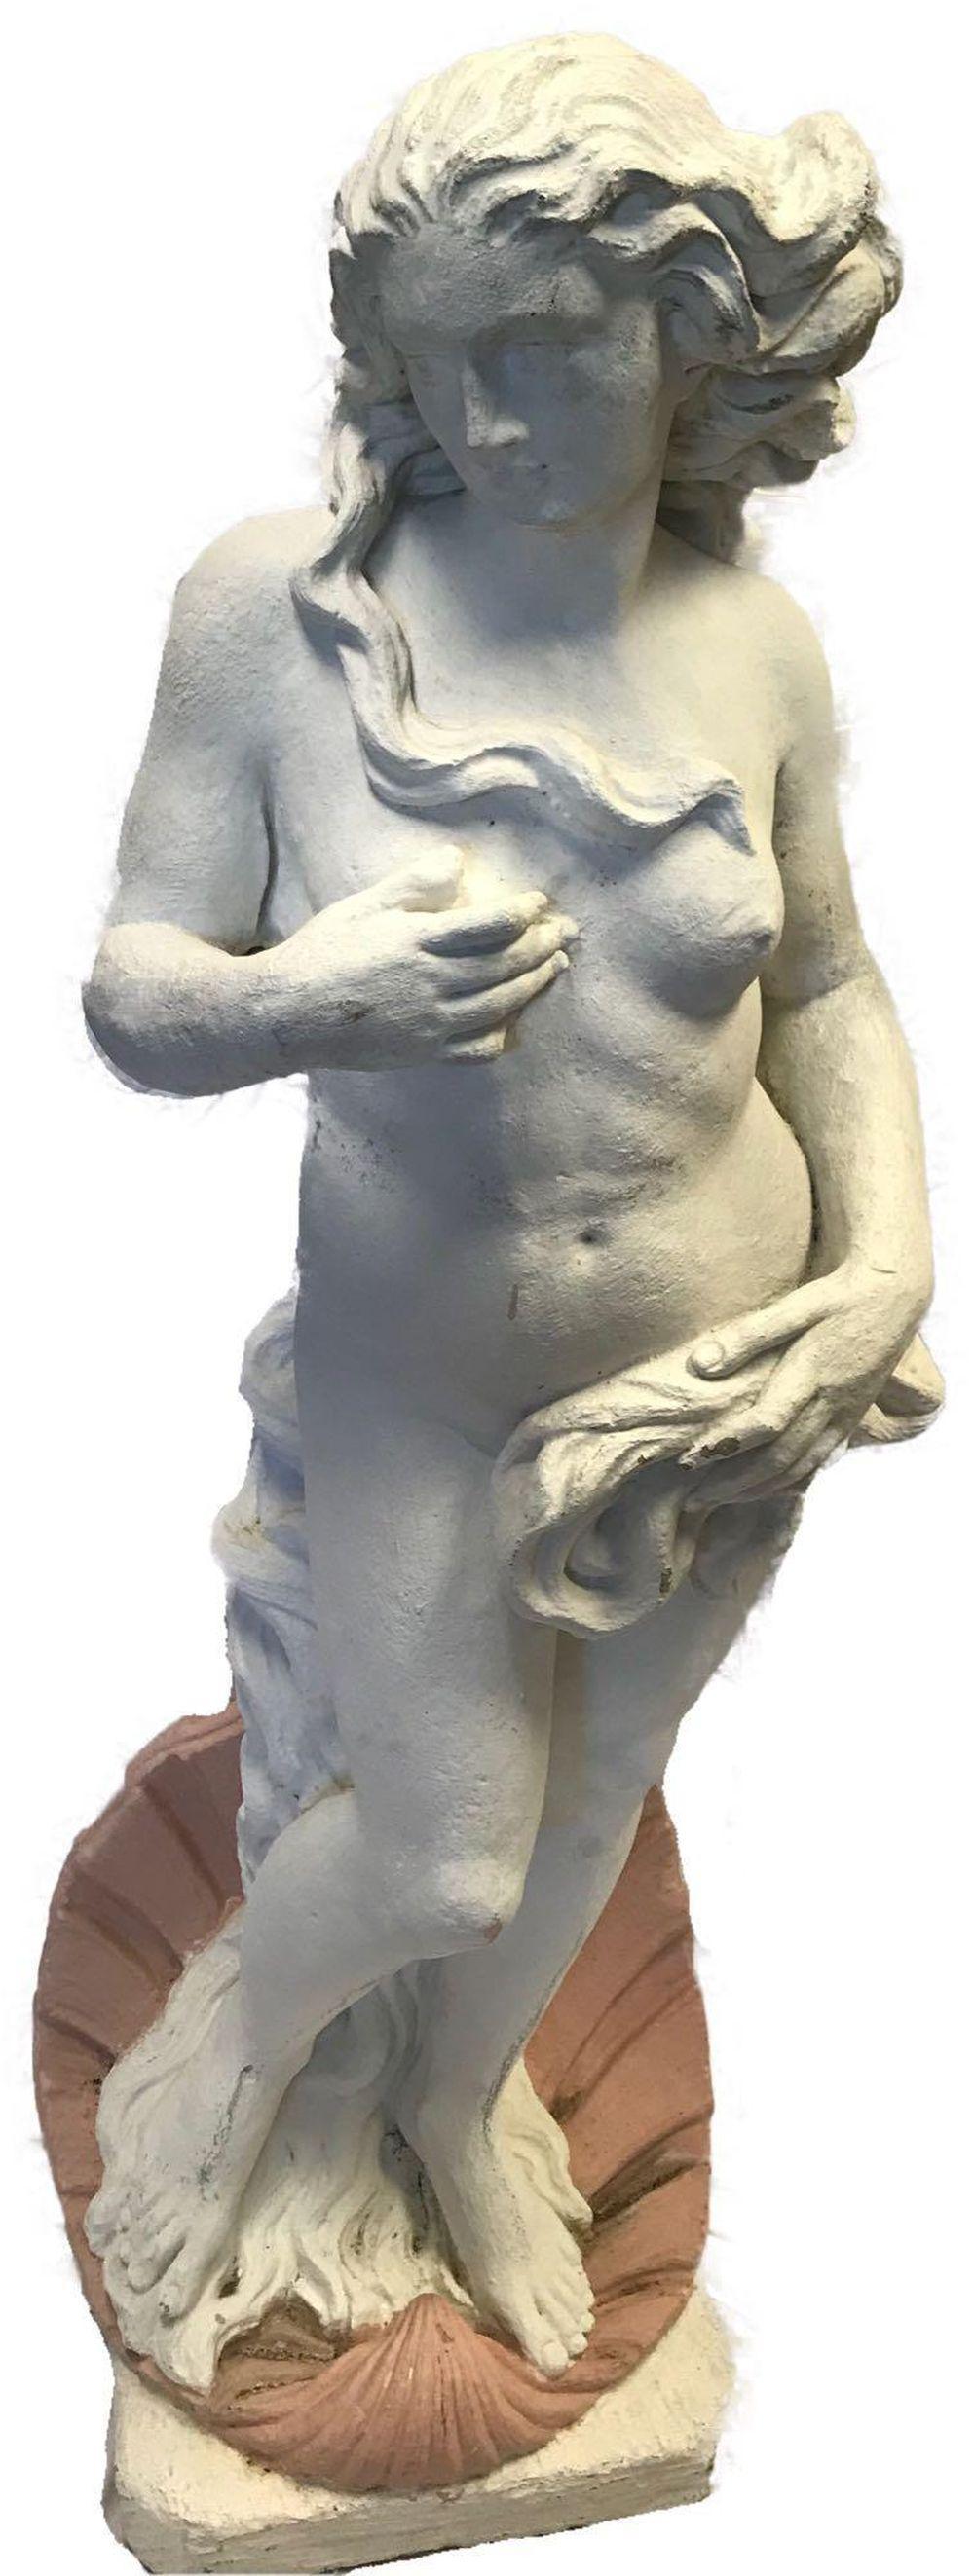 "Garden Statue ""The Birth of Venus"" by Botticelli"